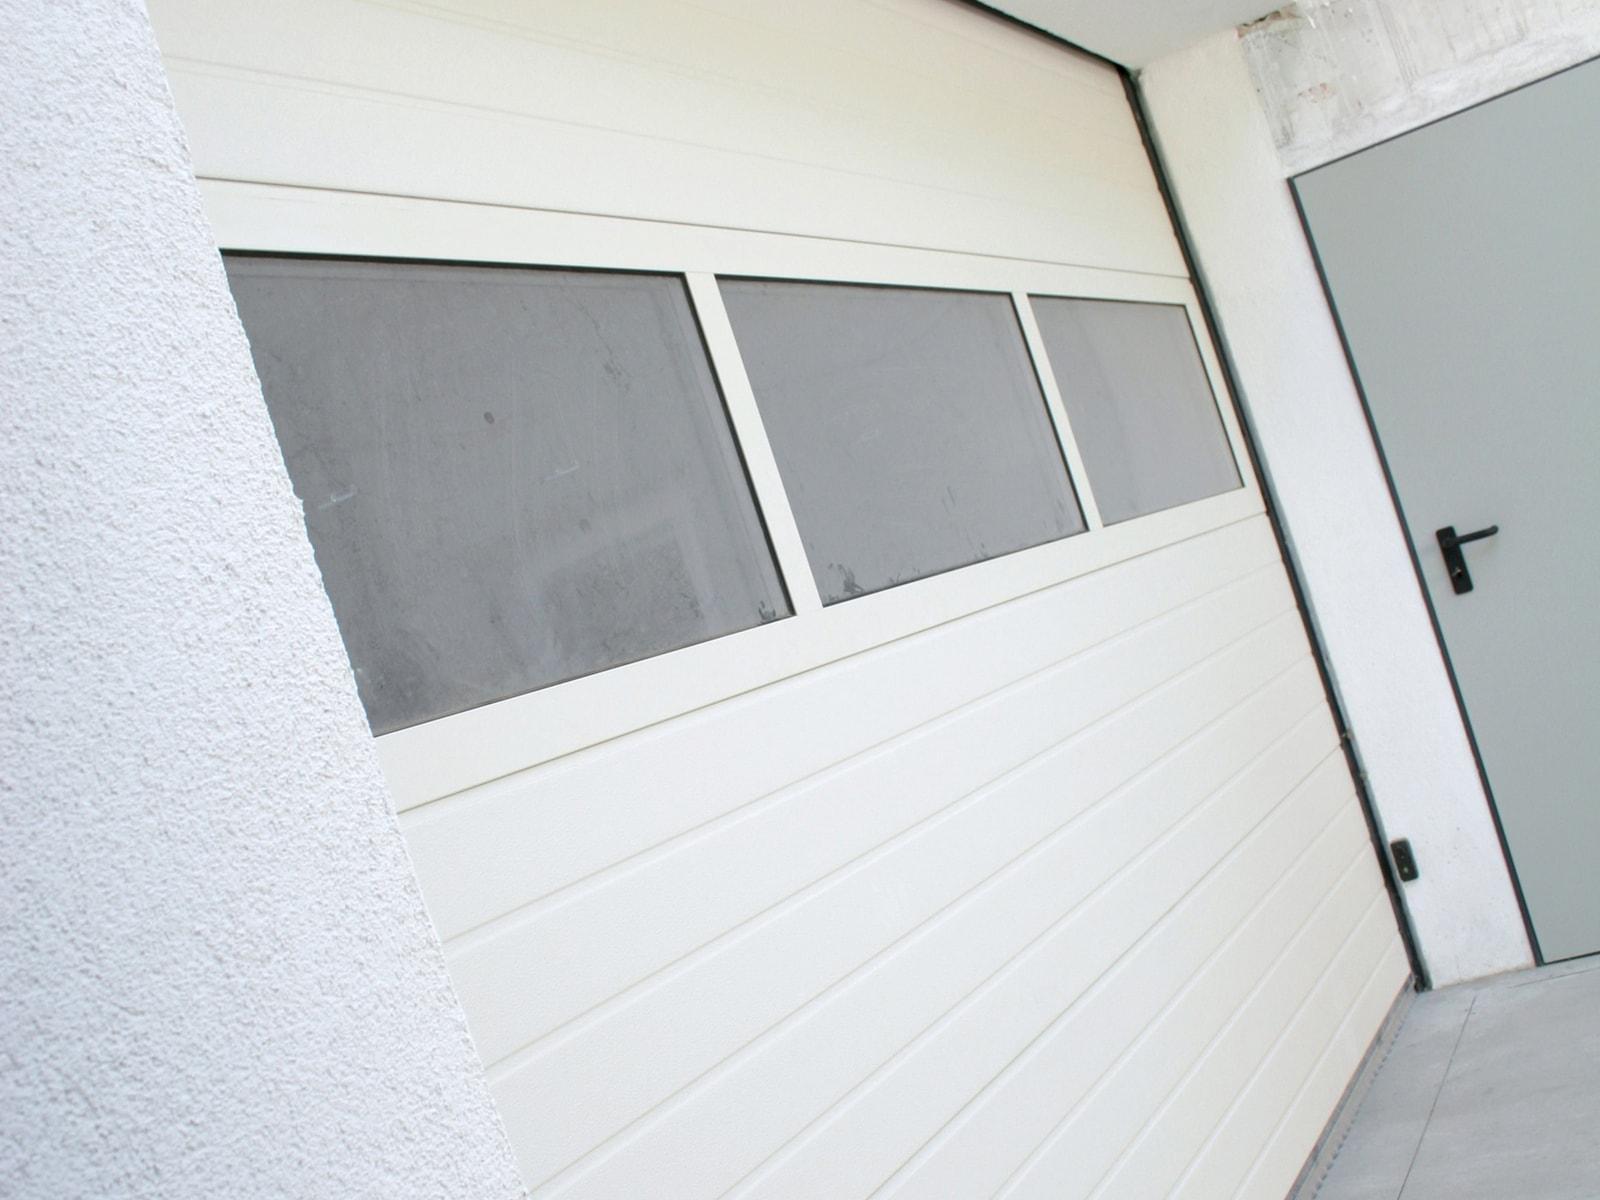 Portone sezionale da garage ARES - Stucco bianco C21 Visa